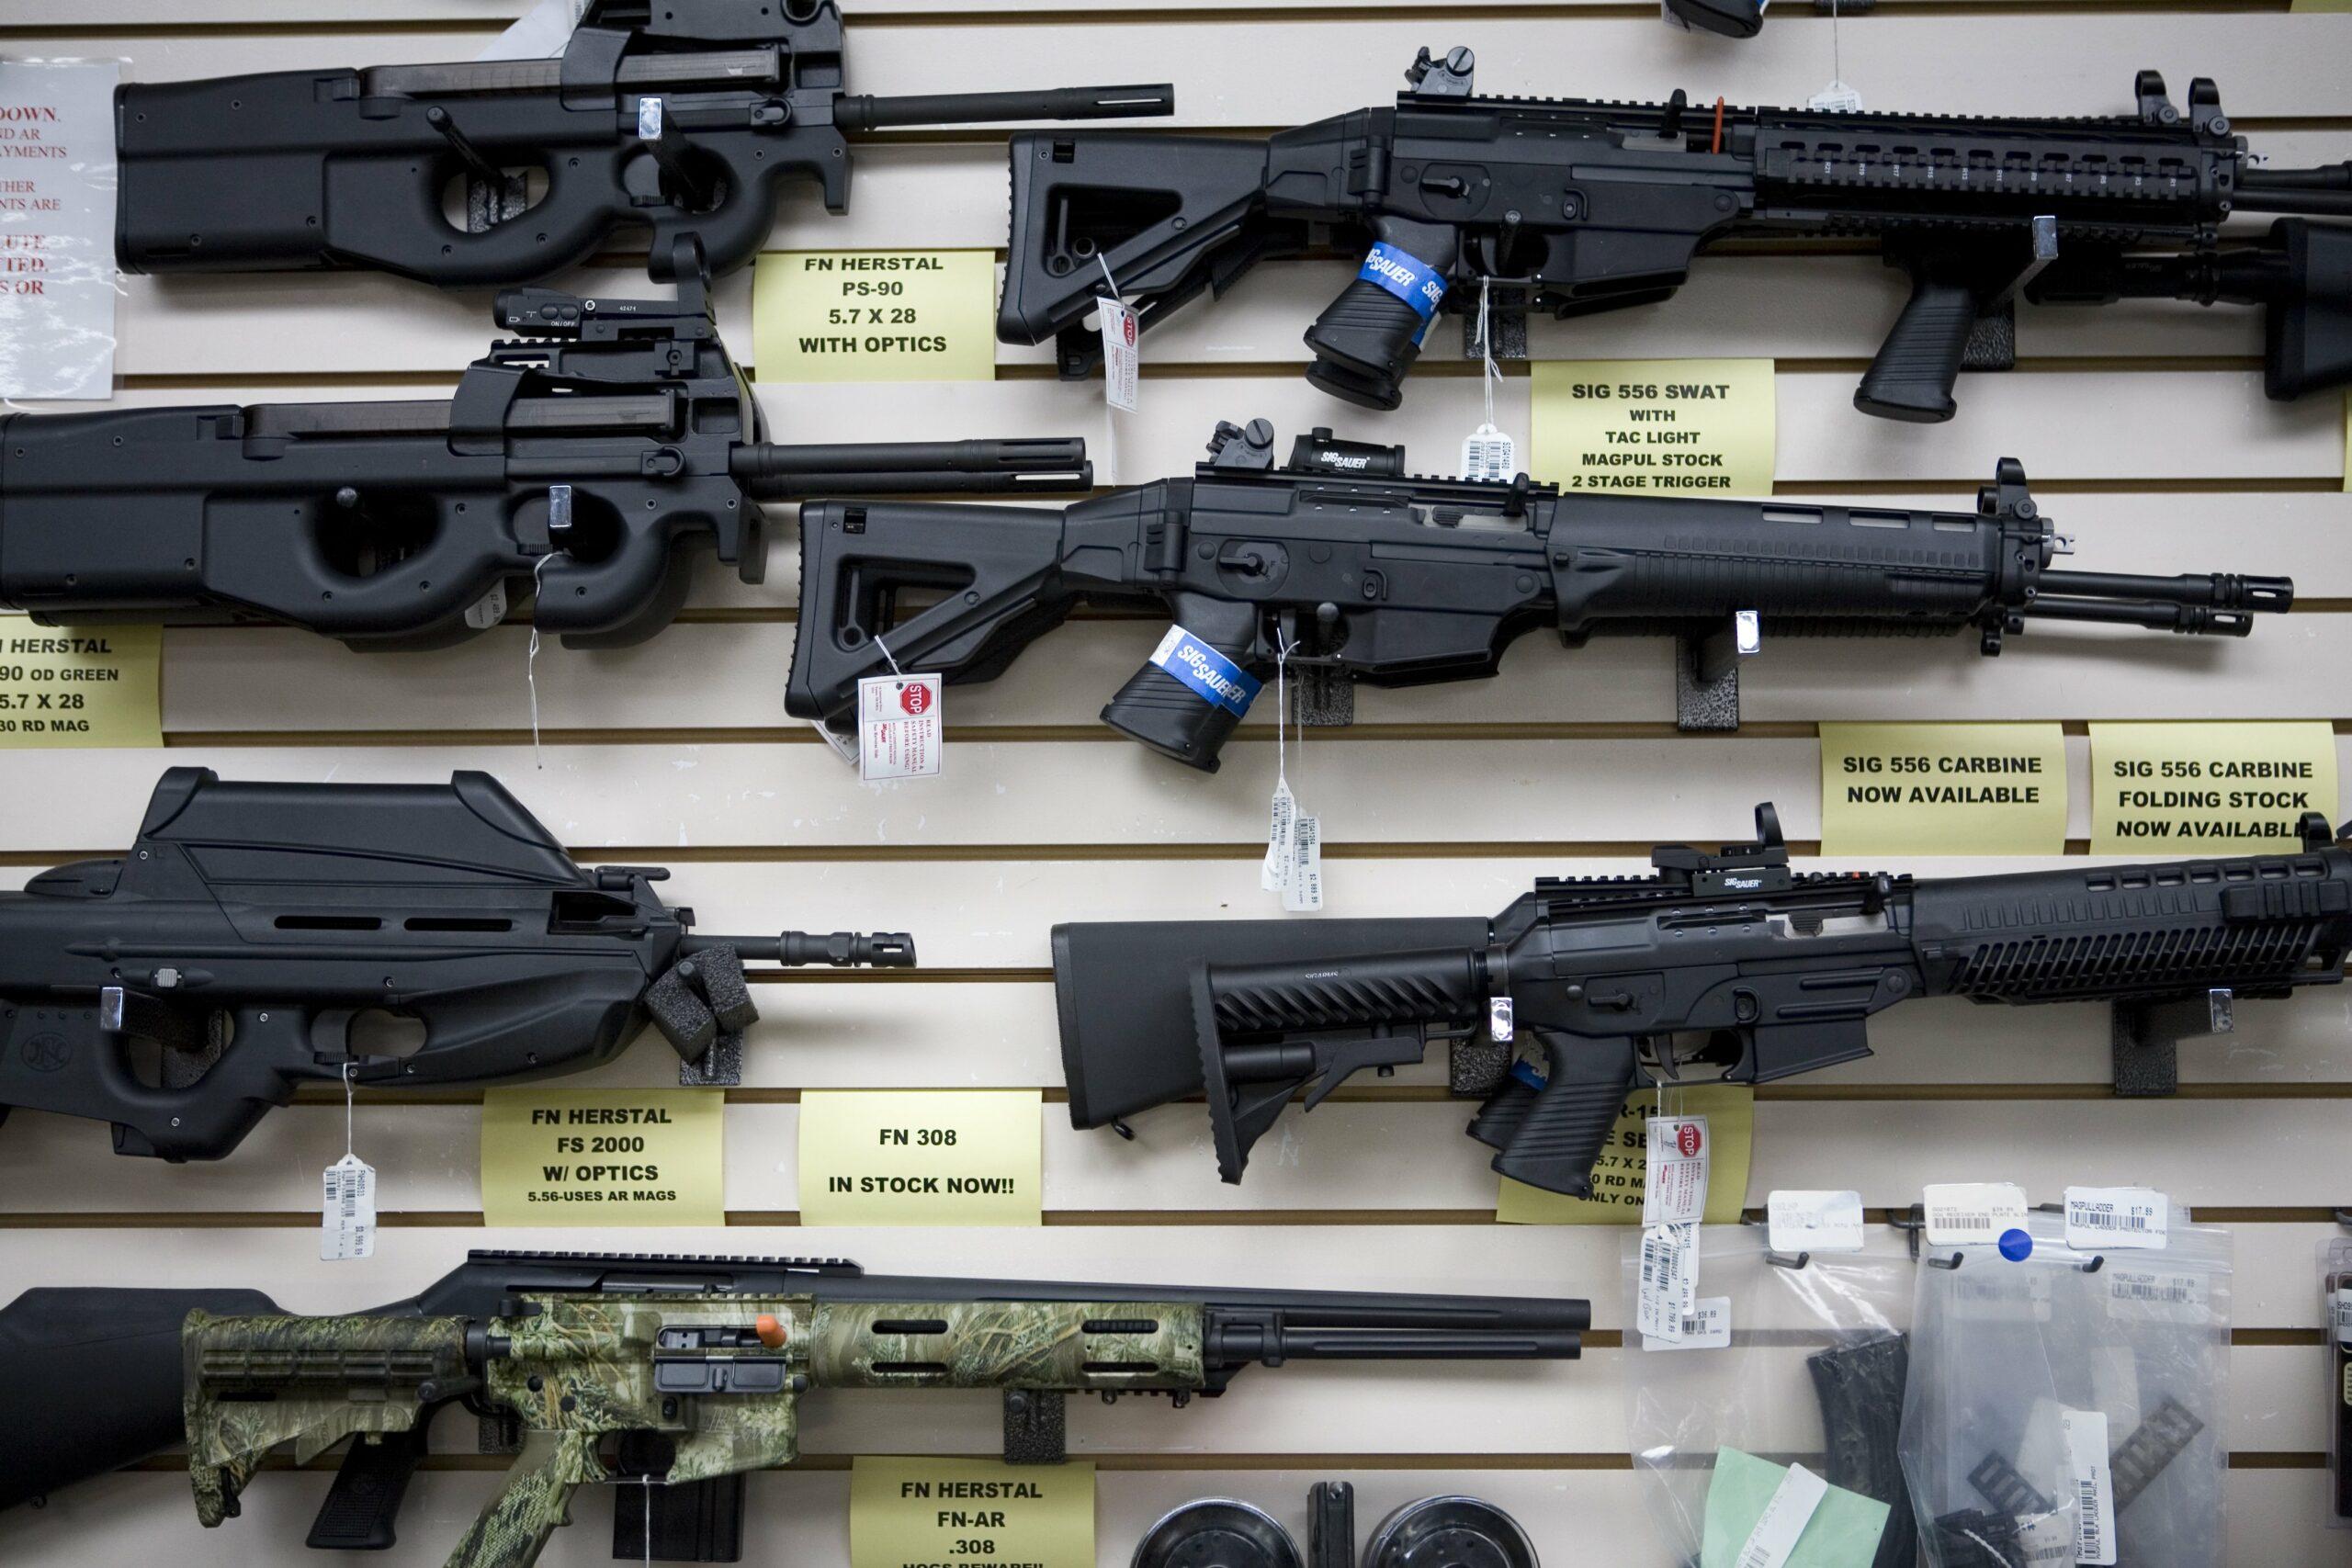 SIPRI Report 2021: U.S. Tops Weapon Exports, Saudi Arabia Weapon Imports (Again)